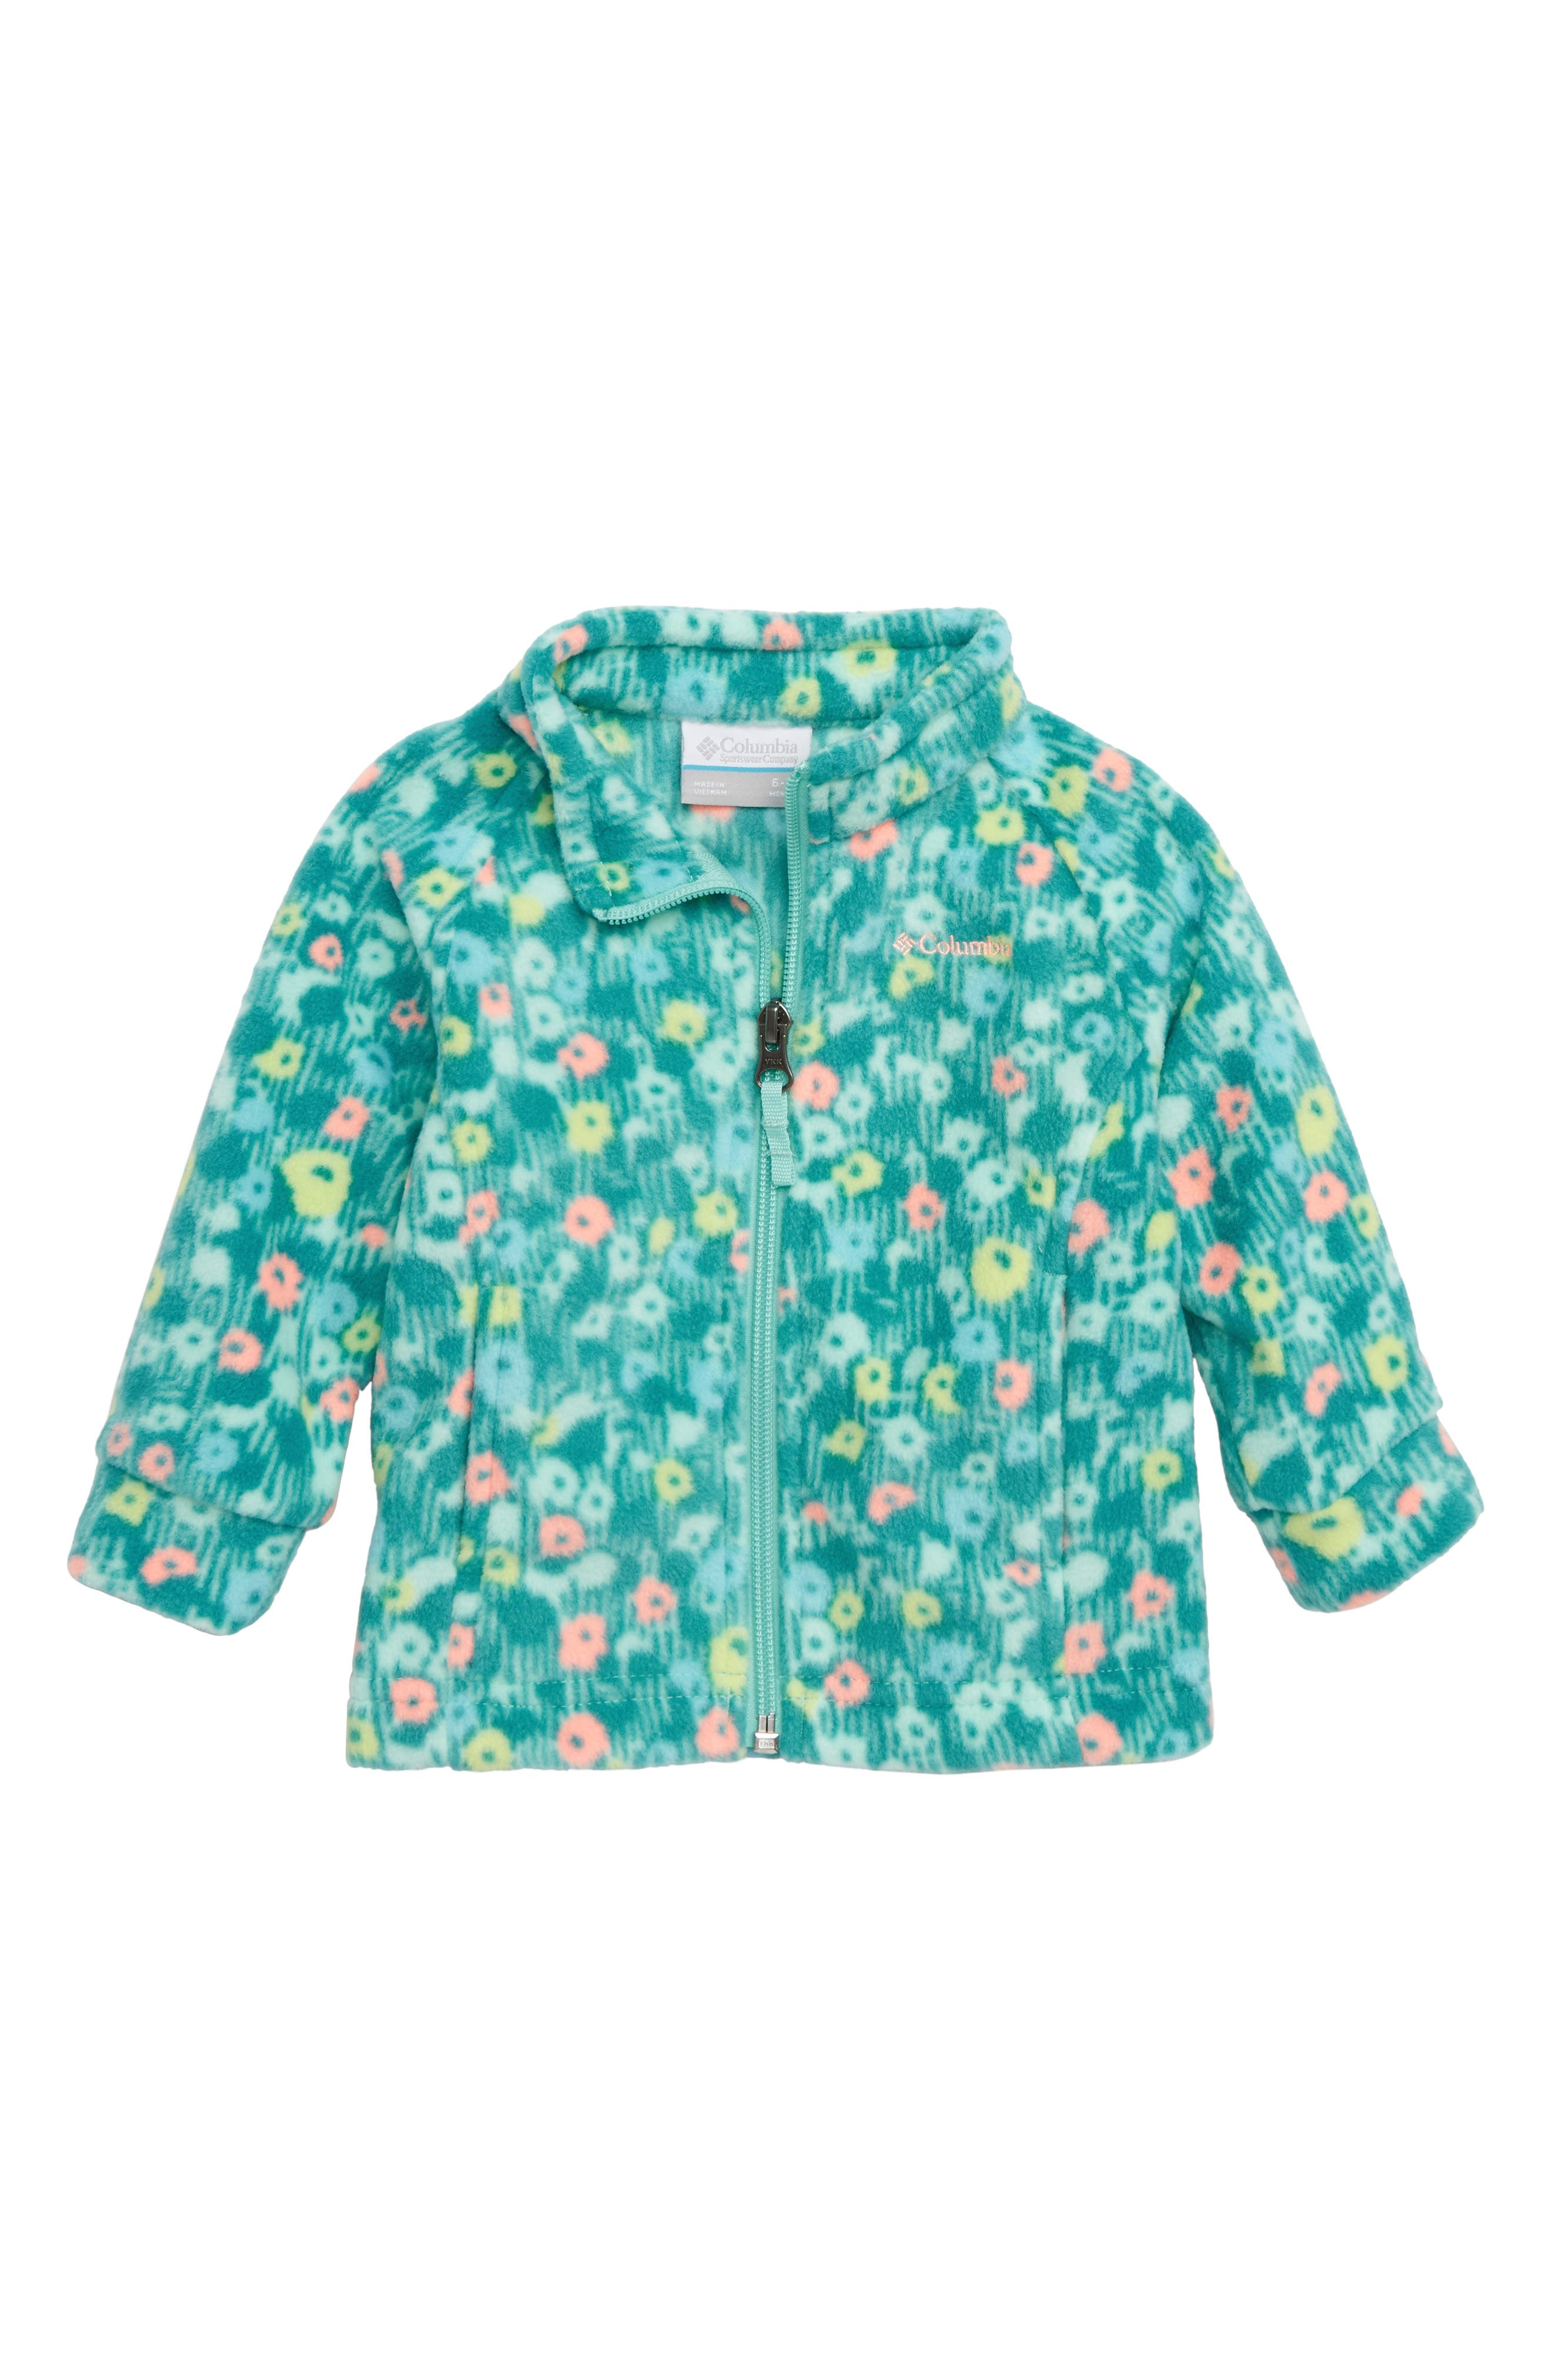 Benton Springs II Fleece Jacket,                         Main,                         color, PIXIE FLORAL PRINT